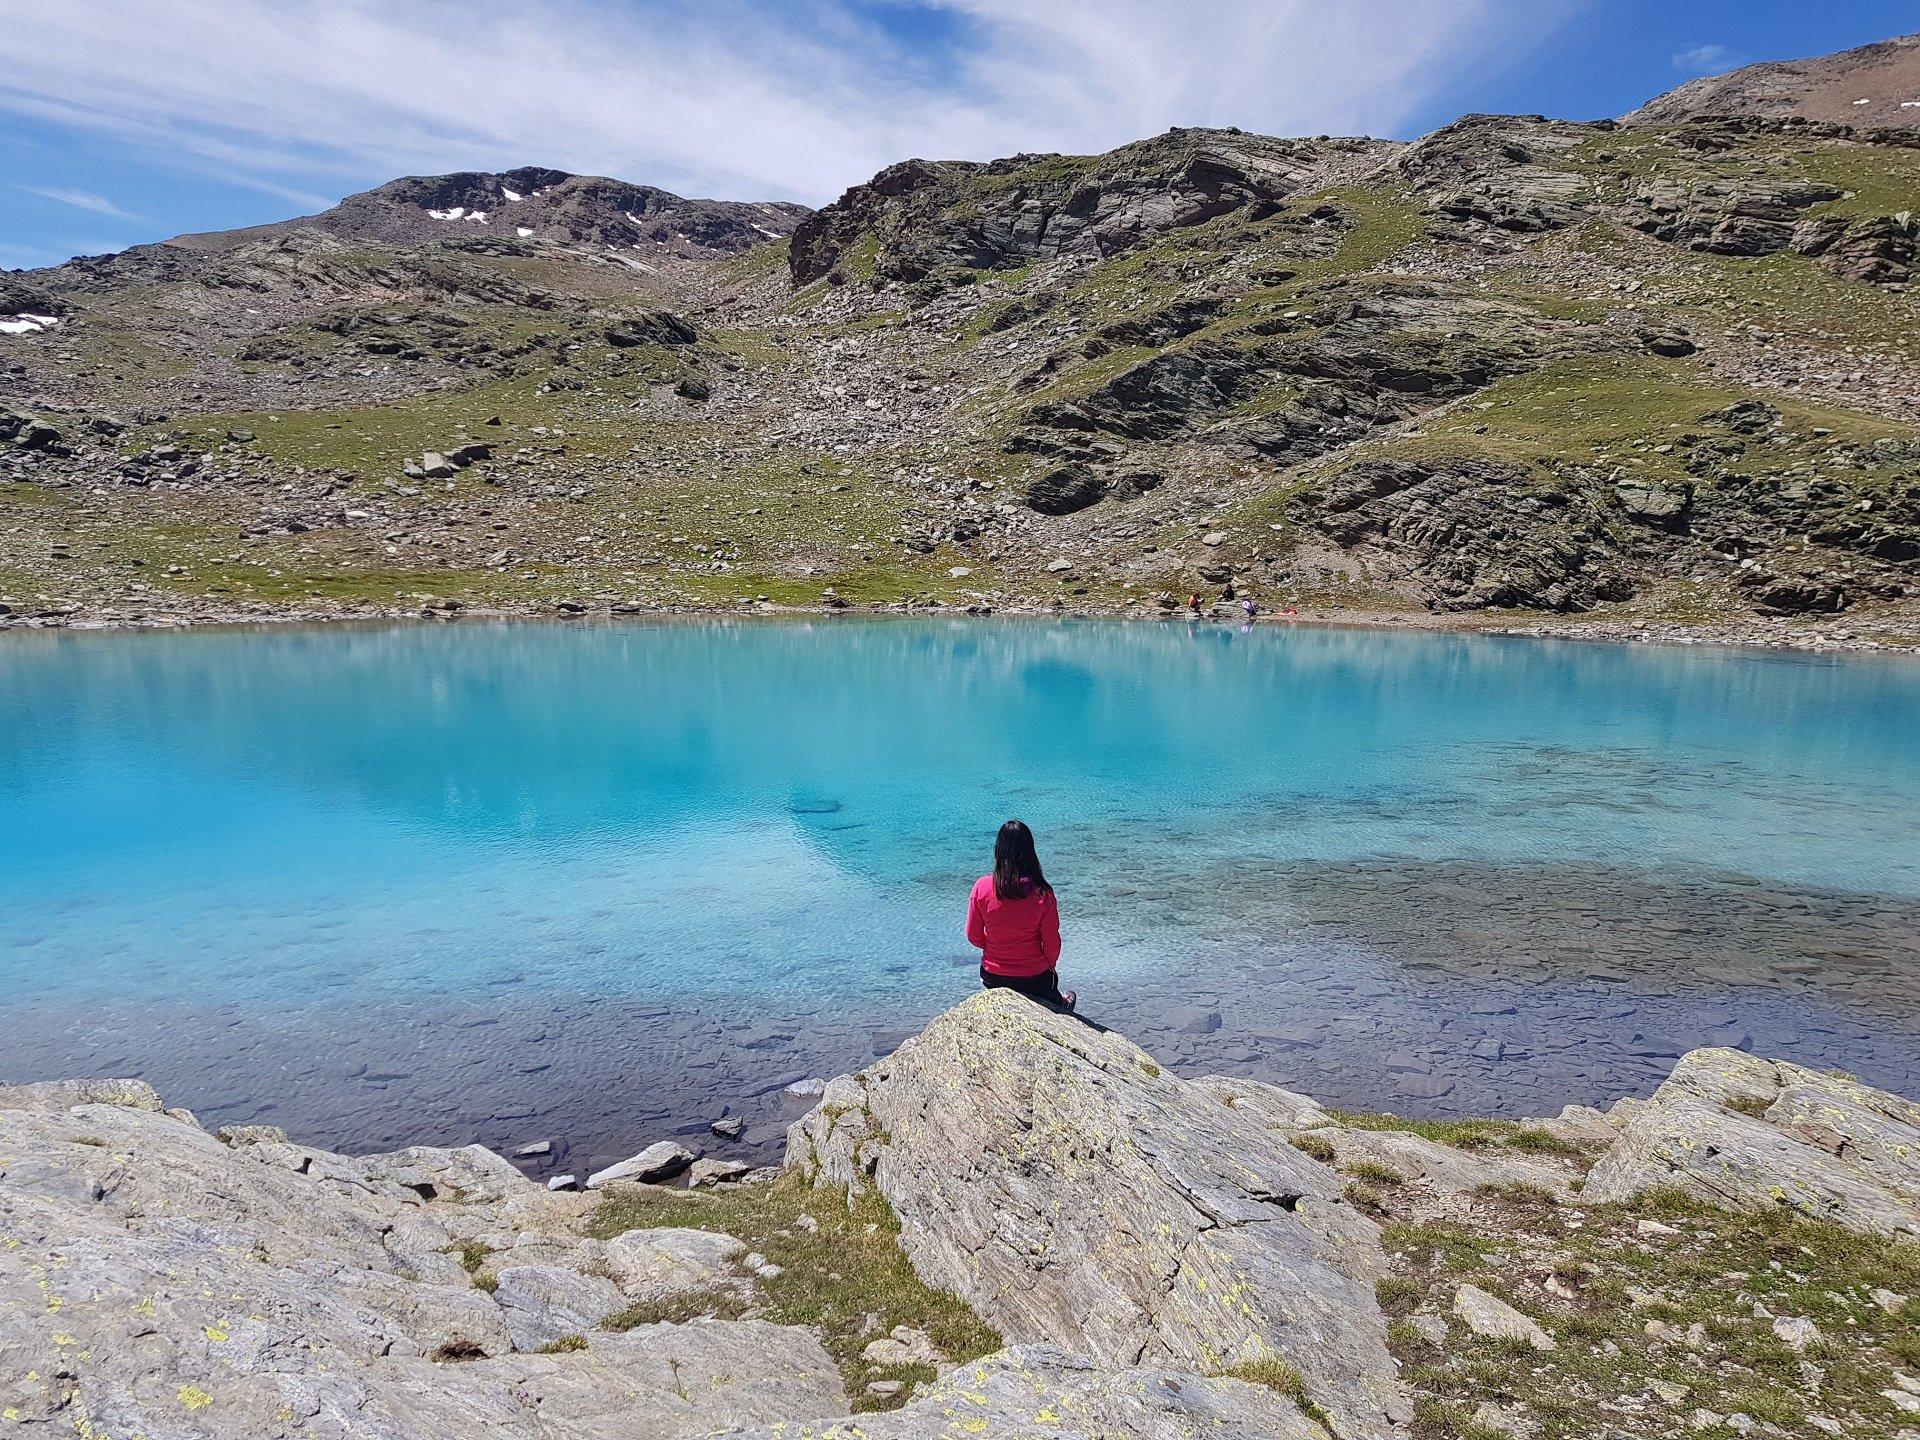 Lago Azzurro Bormio splendida vista